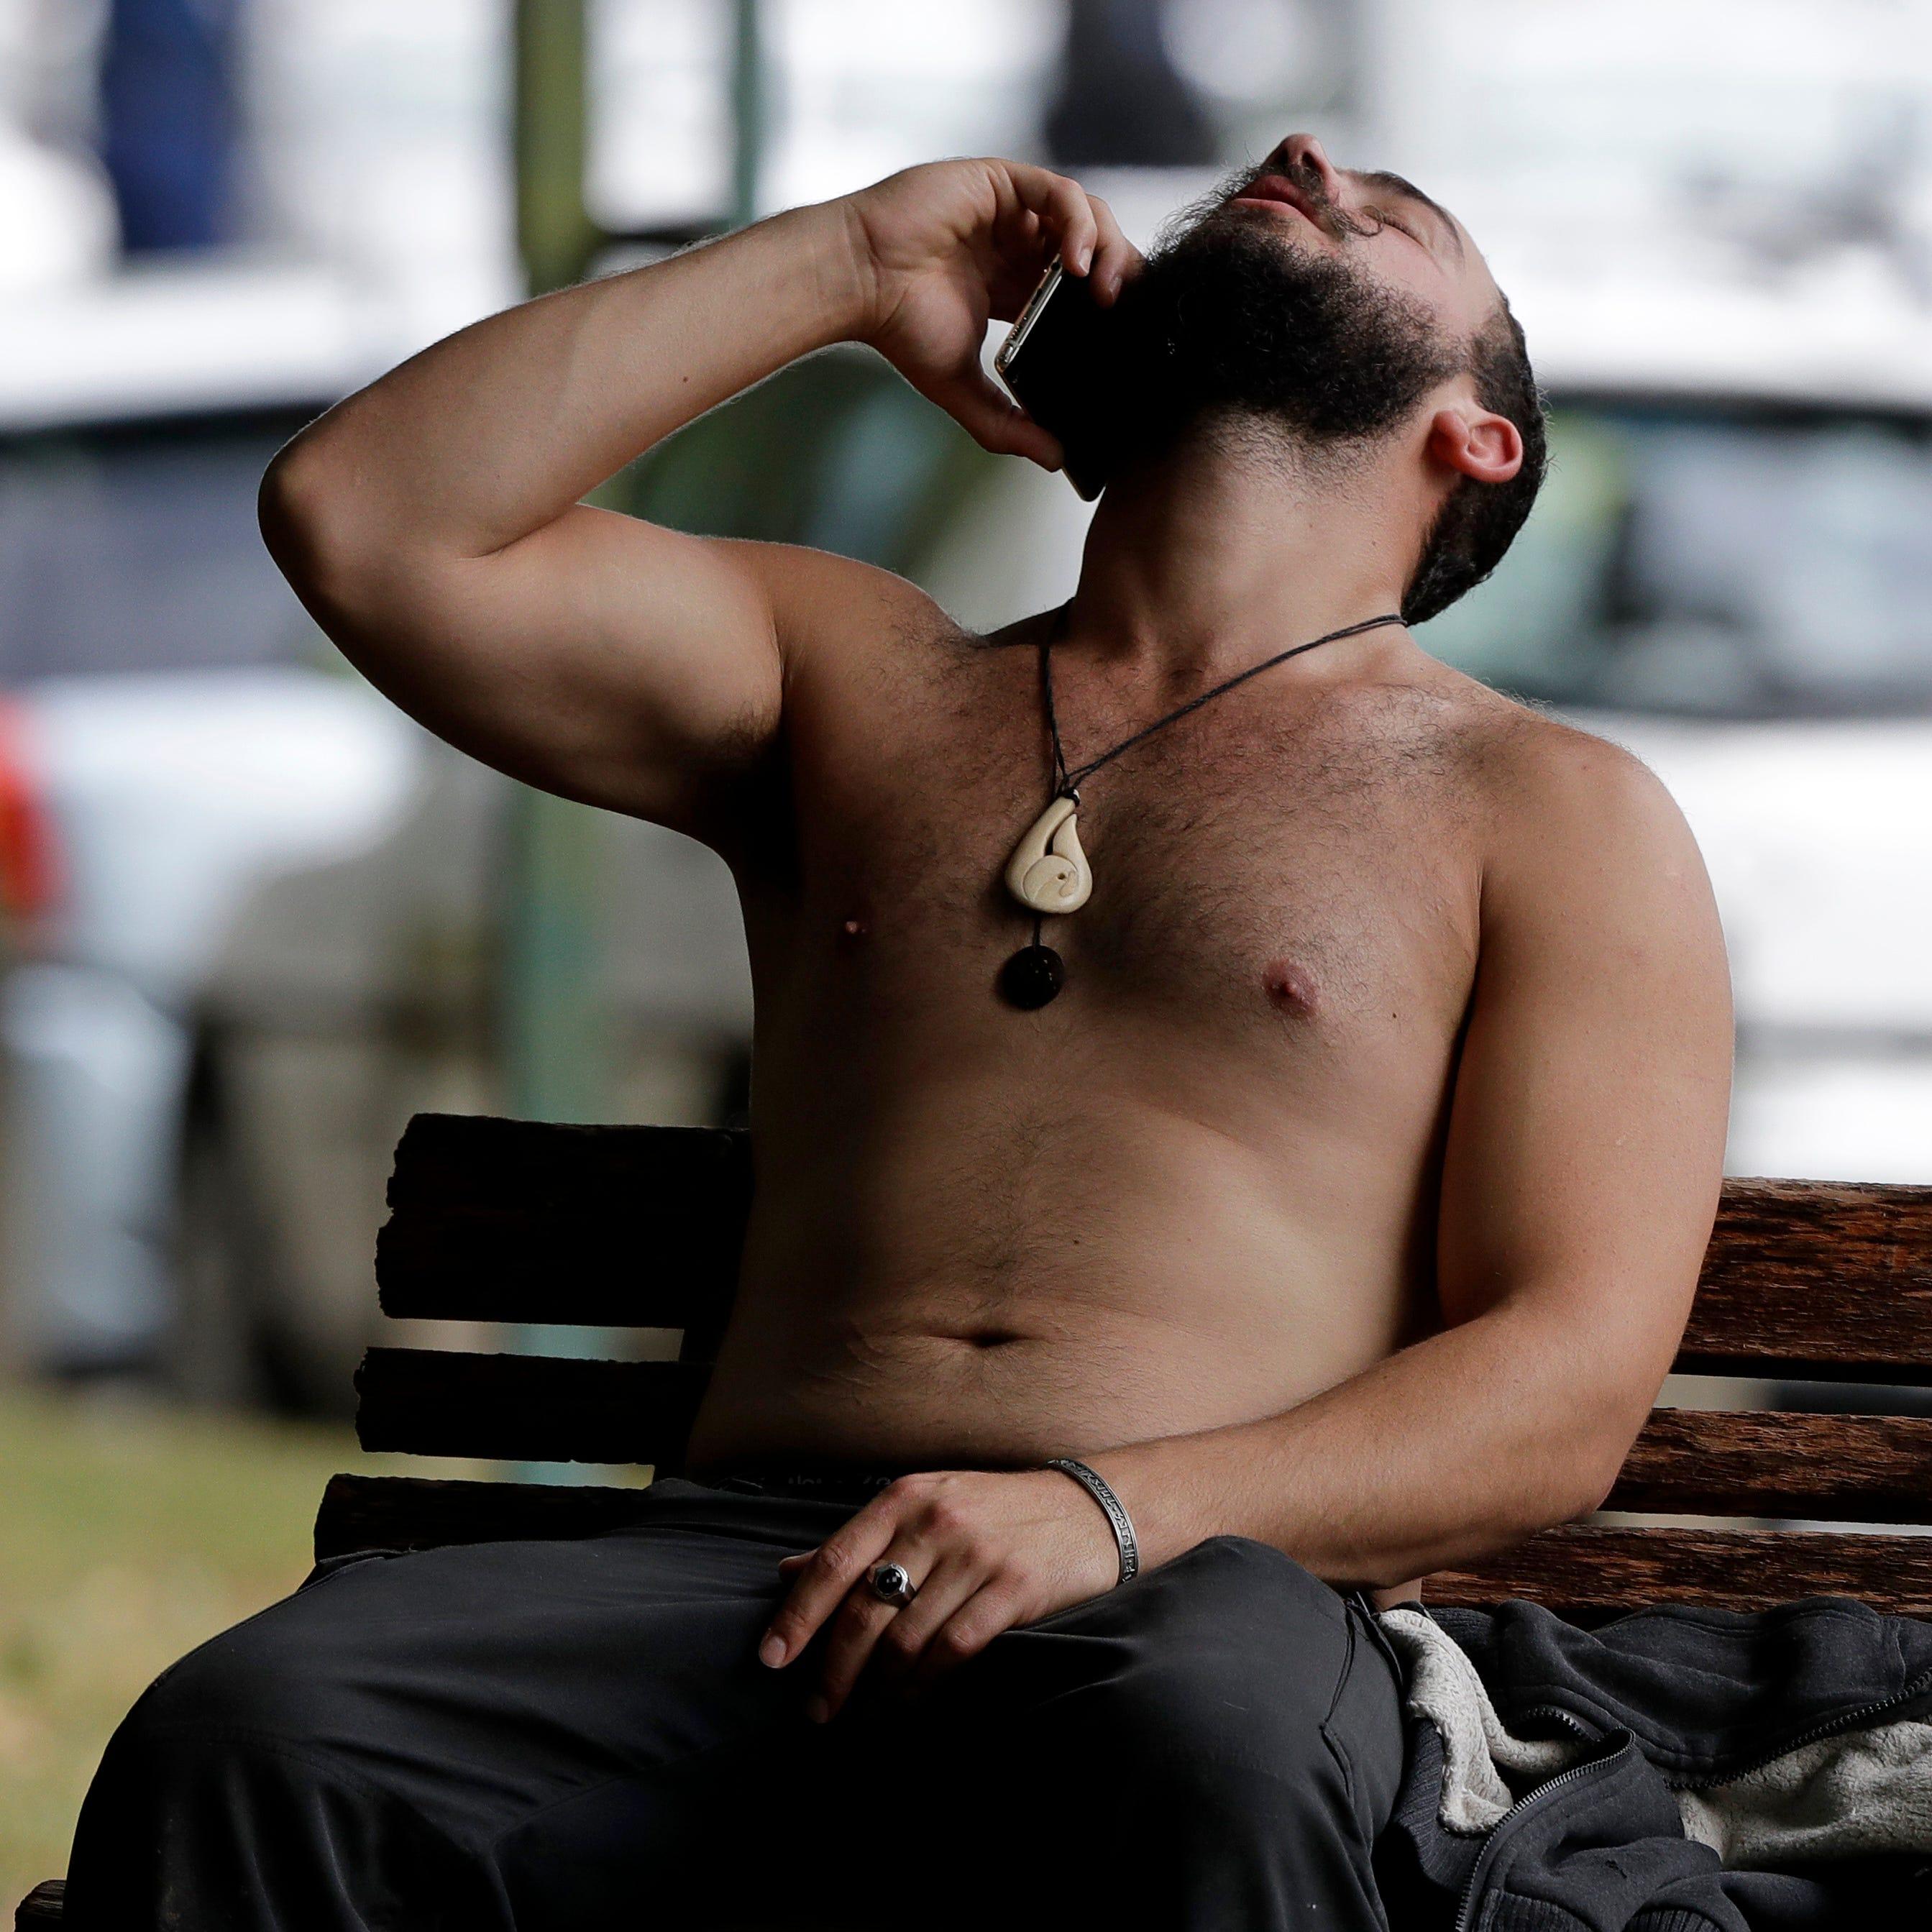 Christchurch gunman appeared to live-stream his attack in 17-minute Facebook video